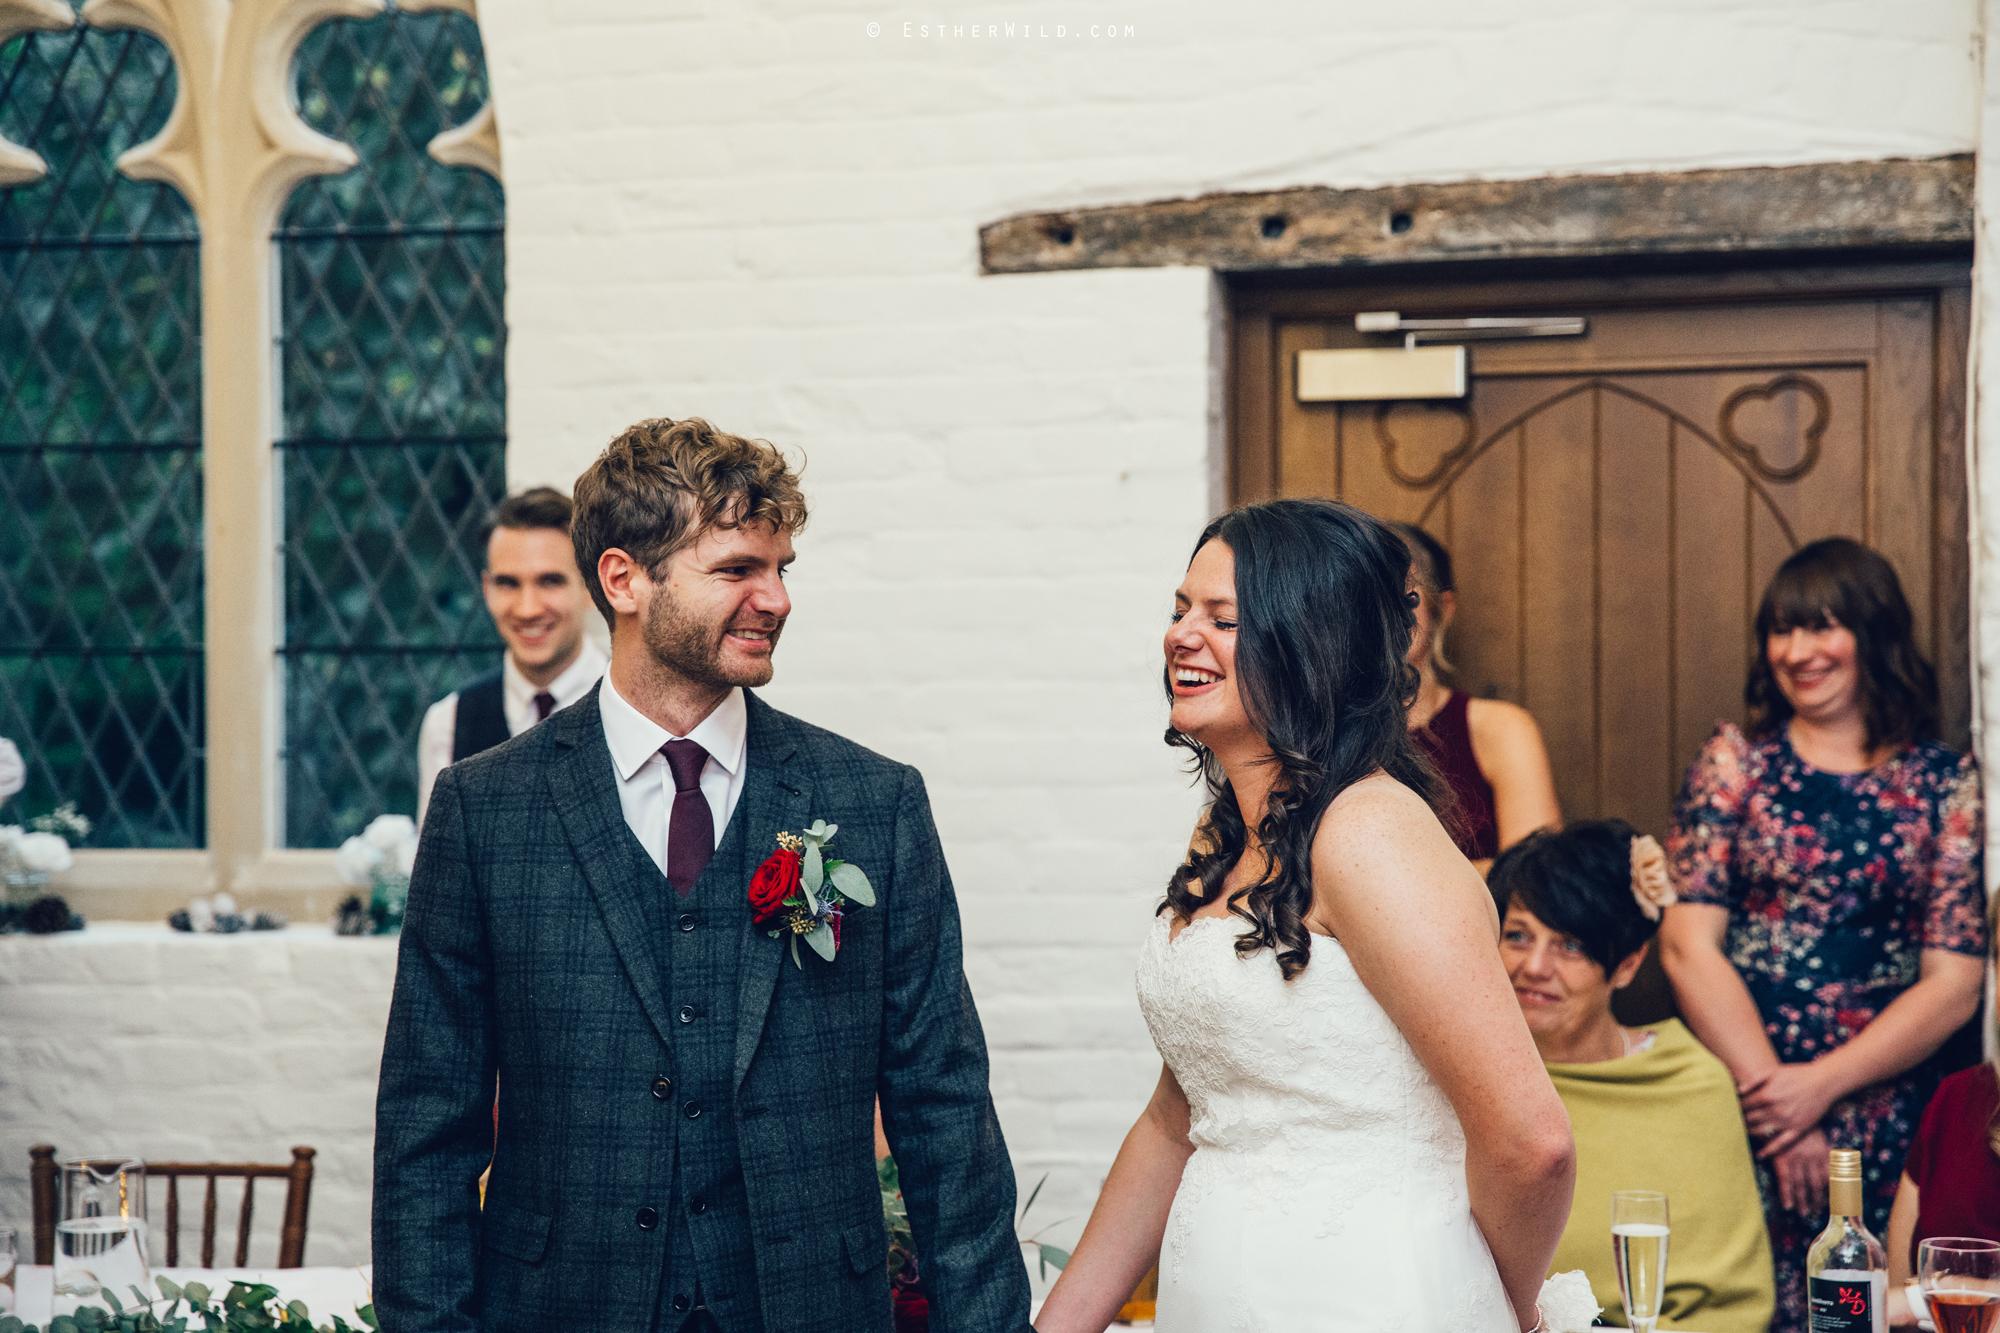 Reading_Room_Weddings_Alby_Norwich_Photographer_Esther_Wild_IMG_2626.jpg